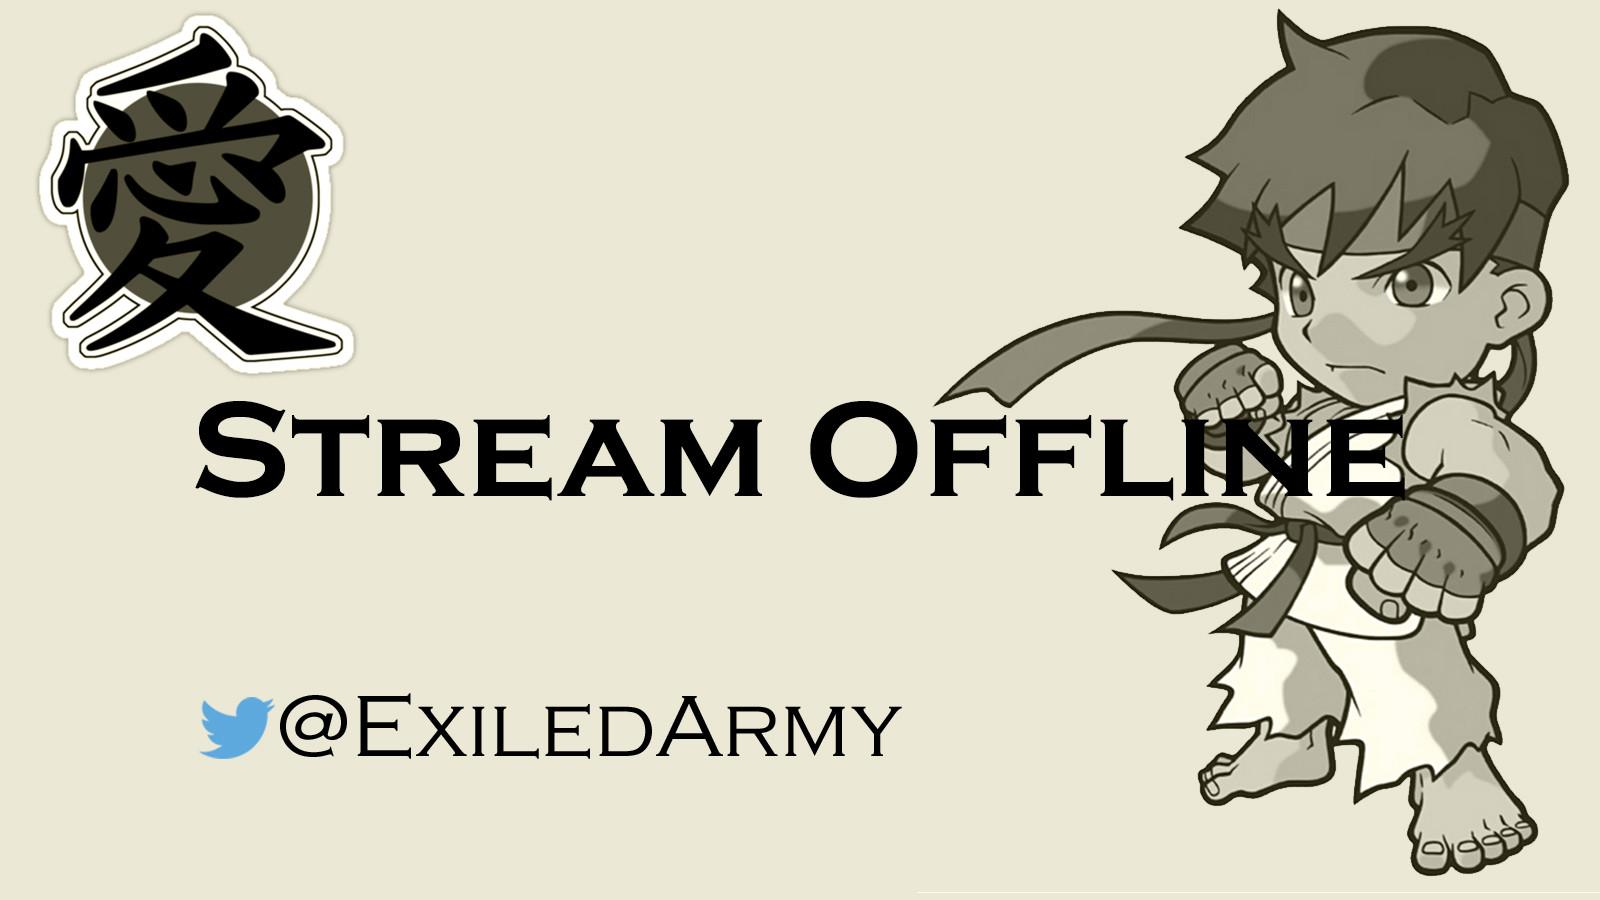 Joe cove offline banner exiledarmy